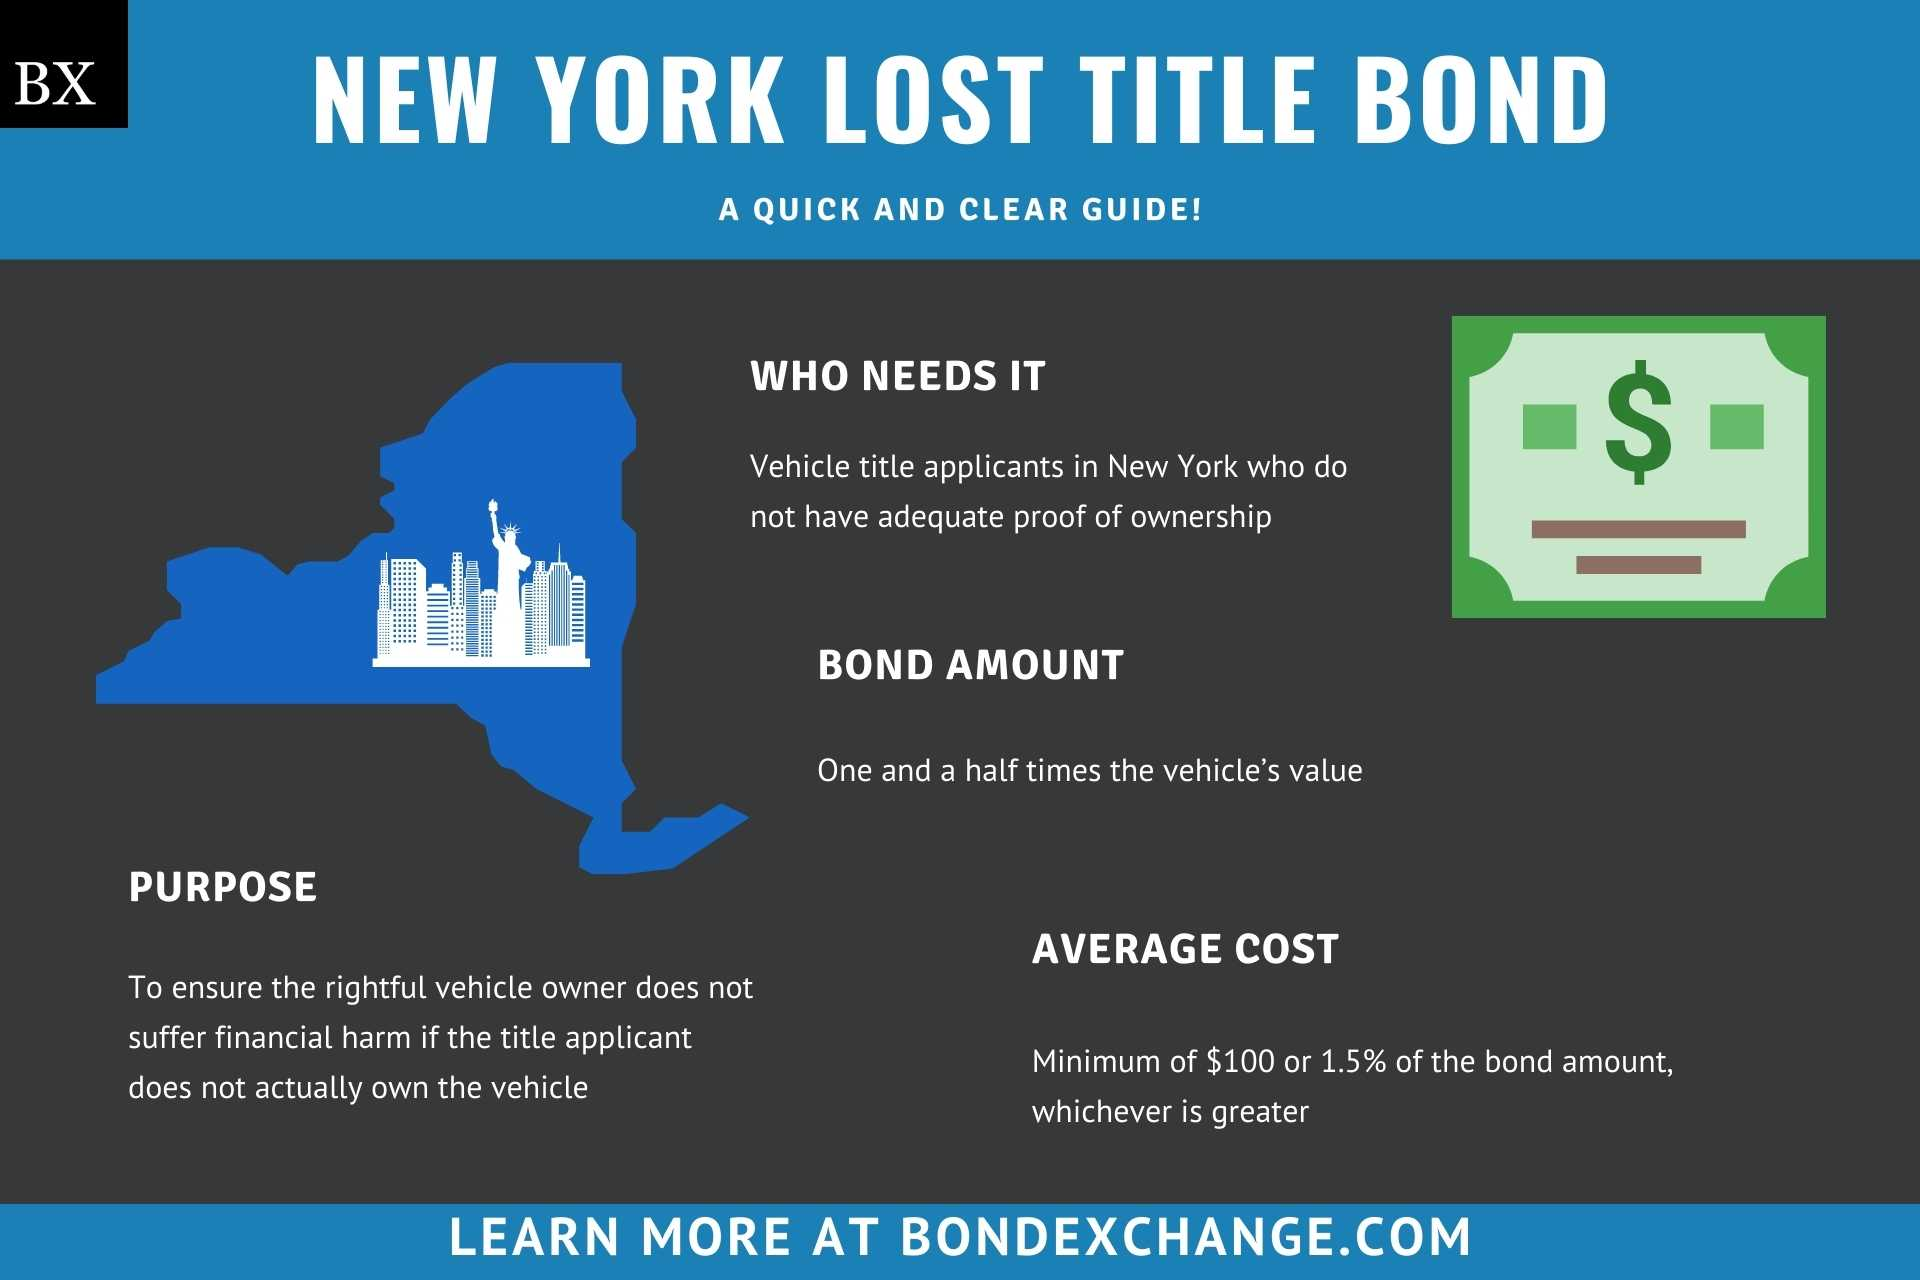 New York Lost Title Bond